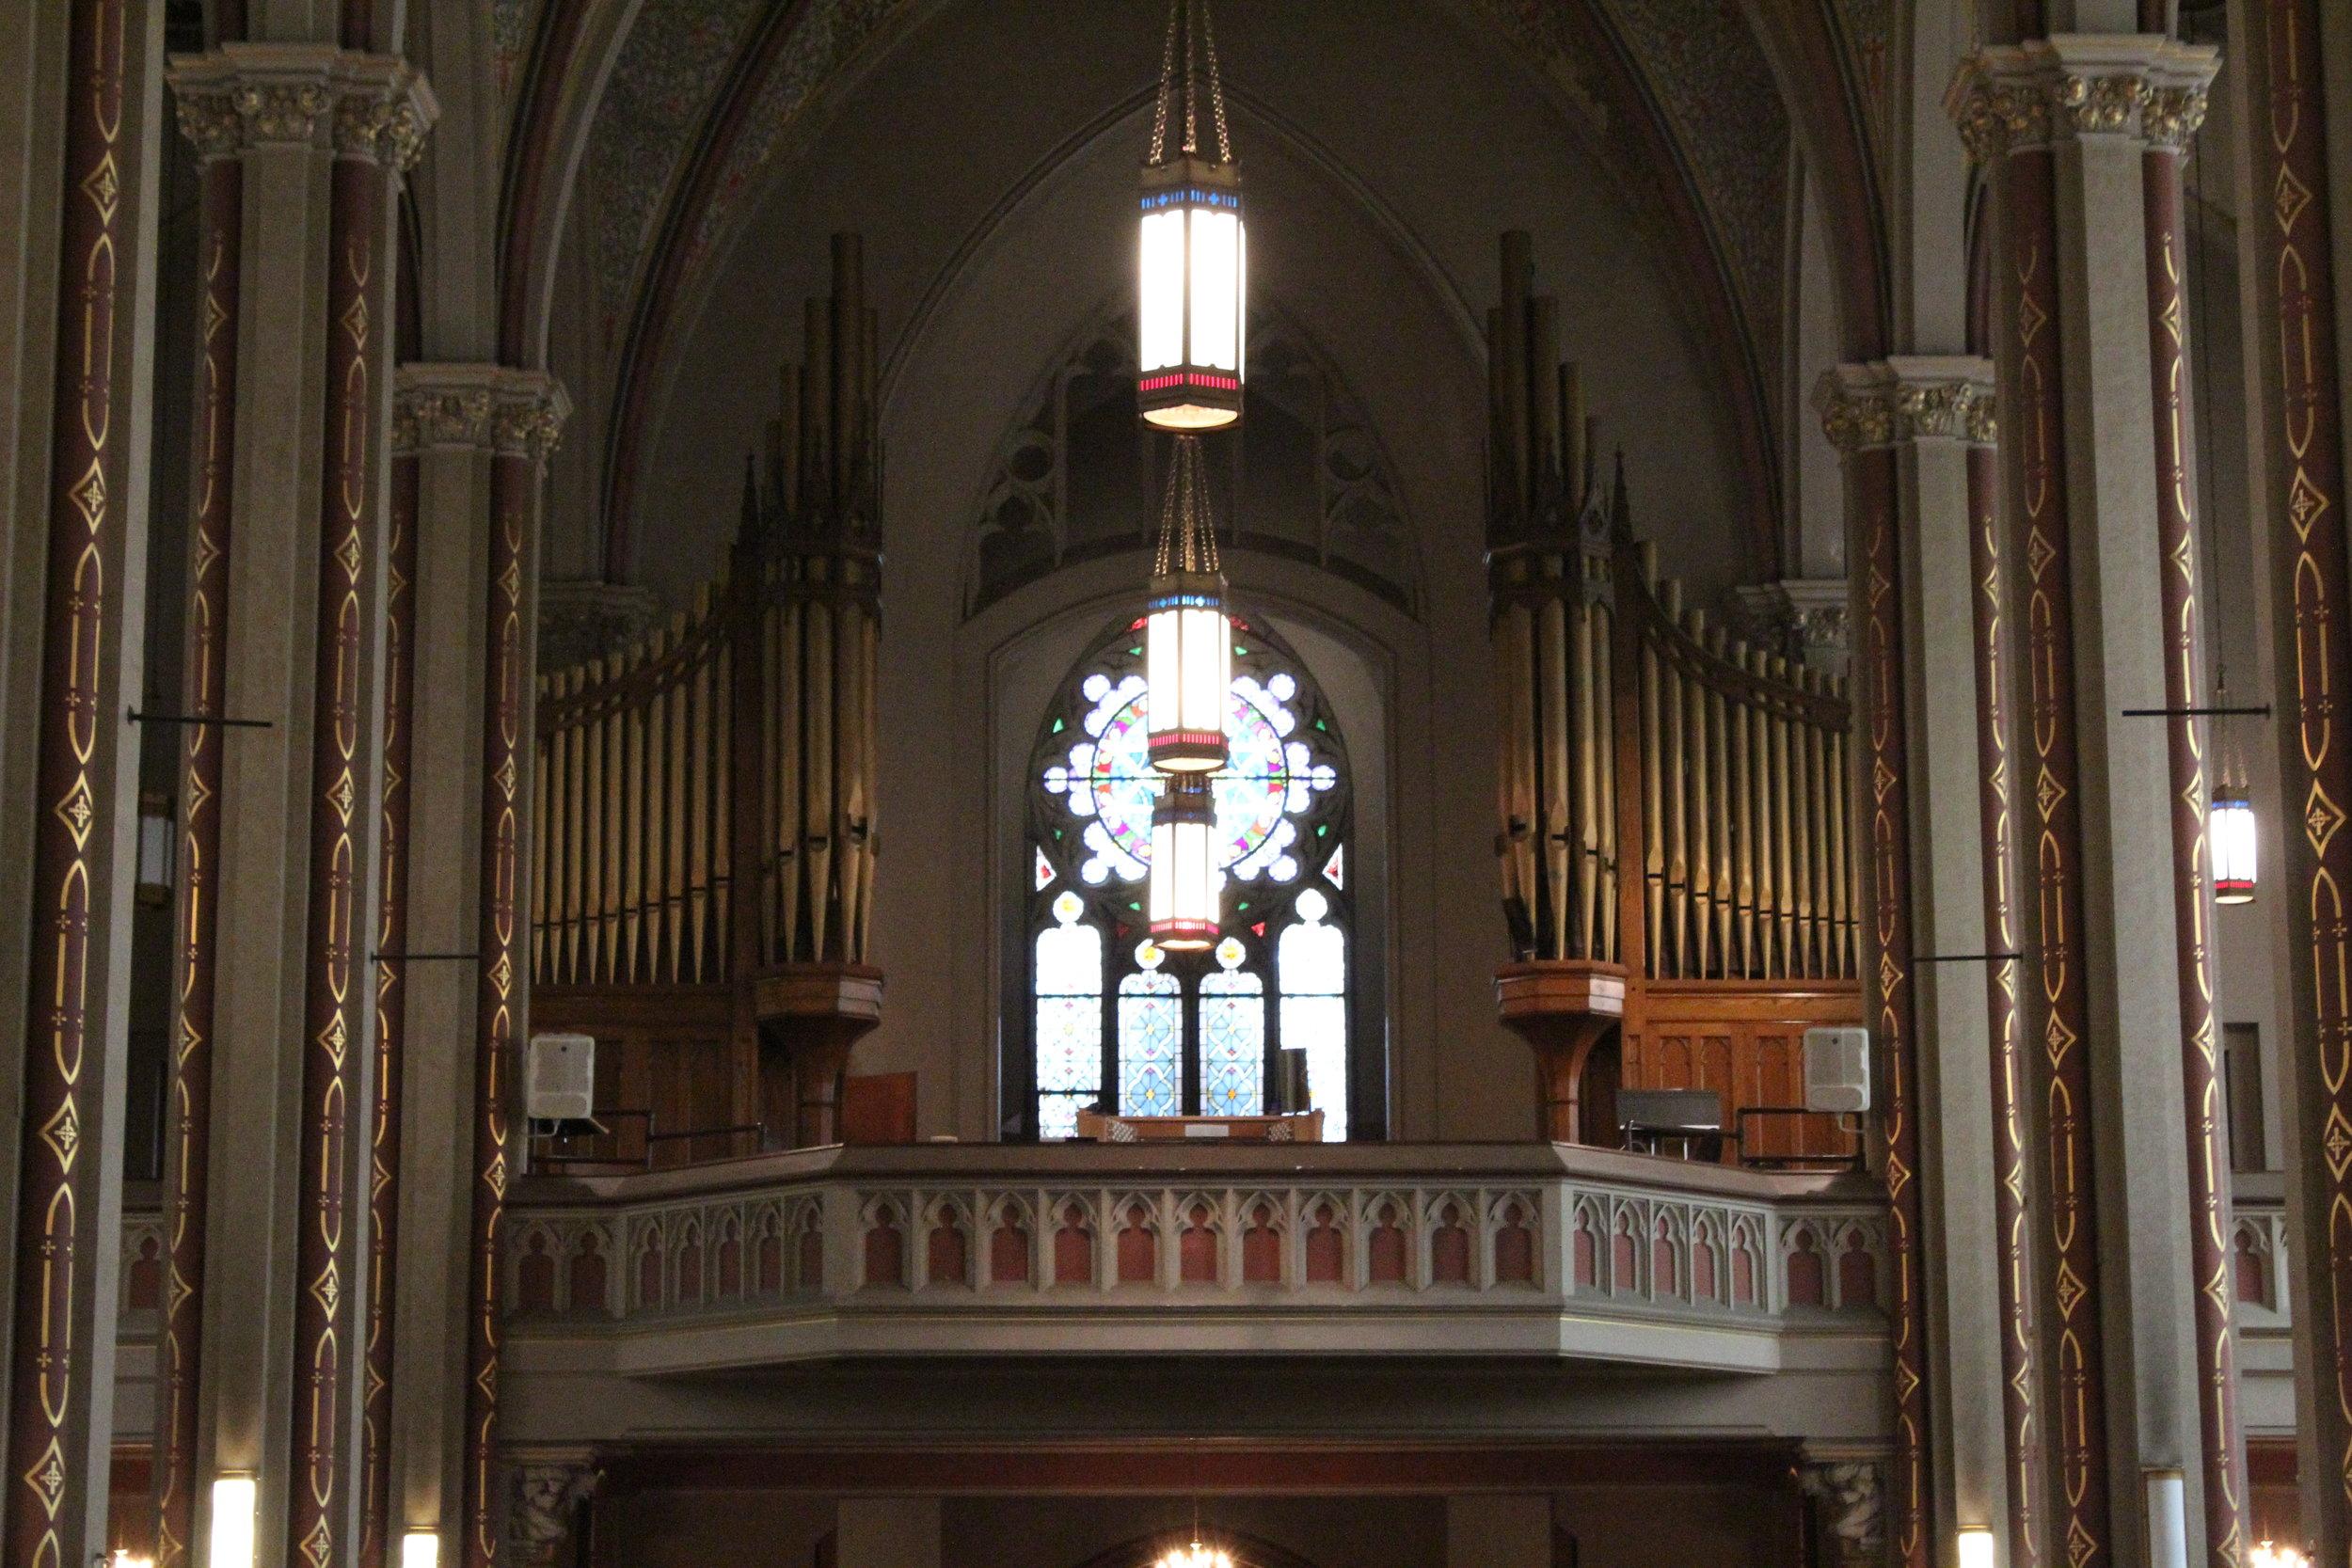 Current Wicks Organ (built in 1924)